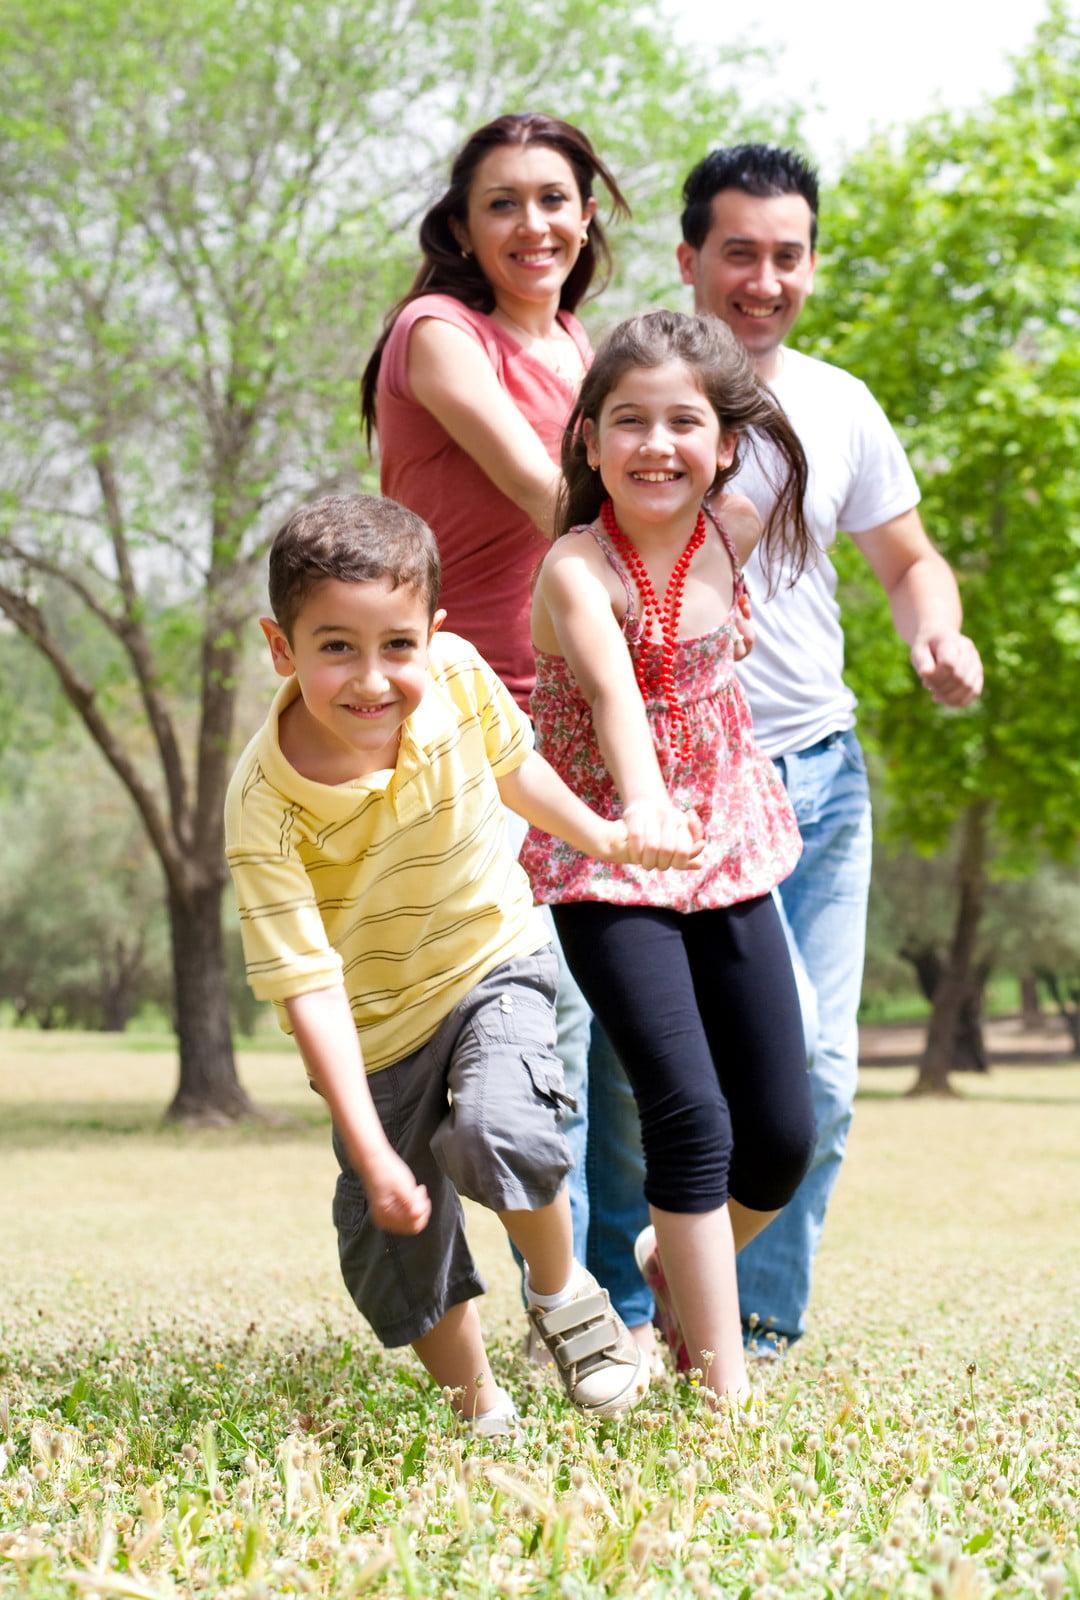 Washington DC Family Law Help